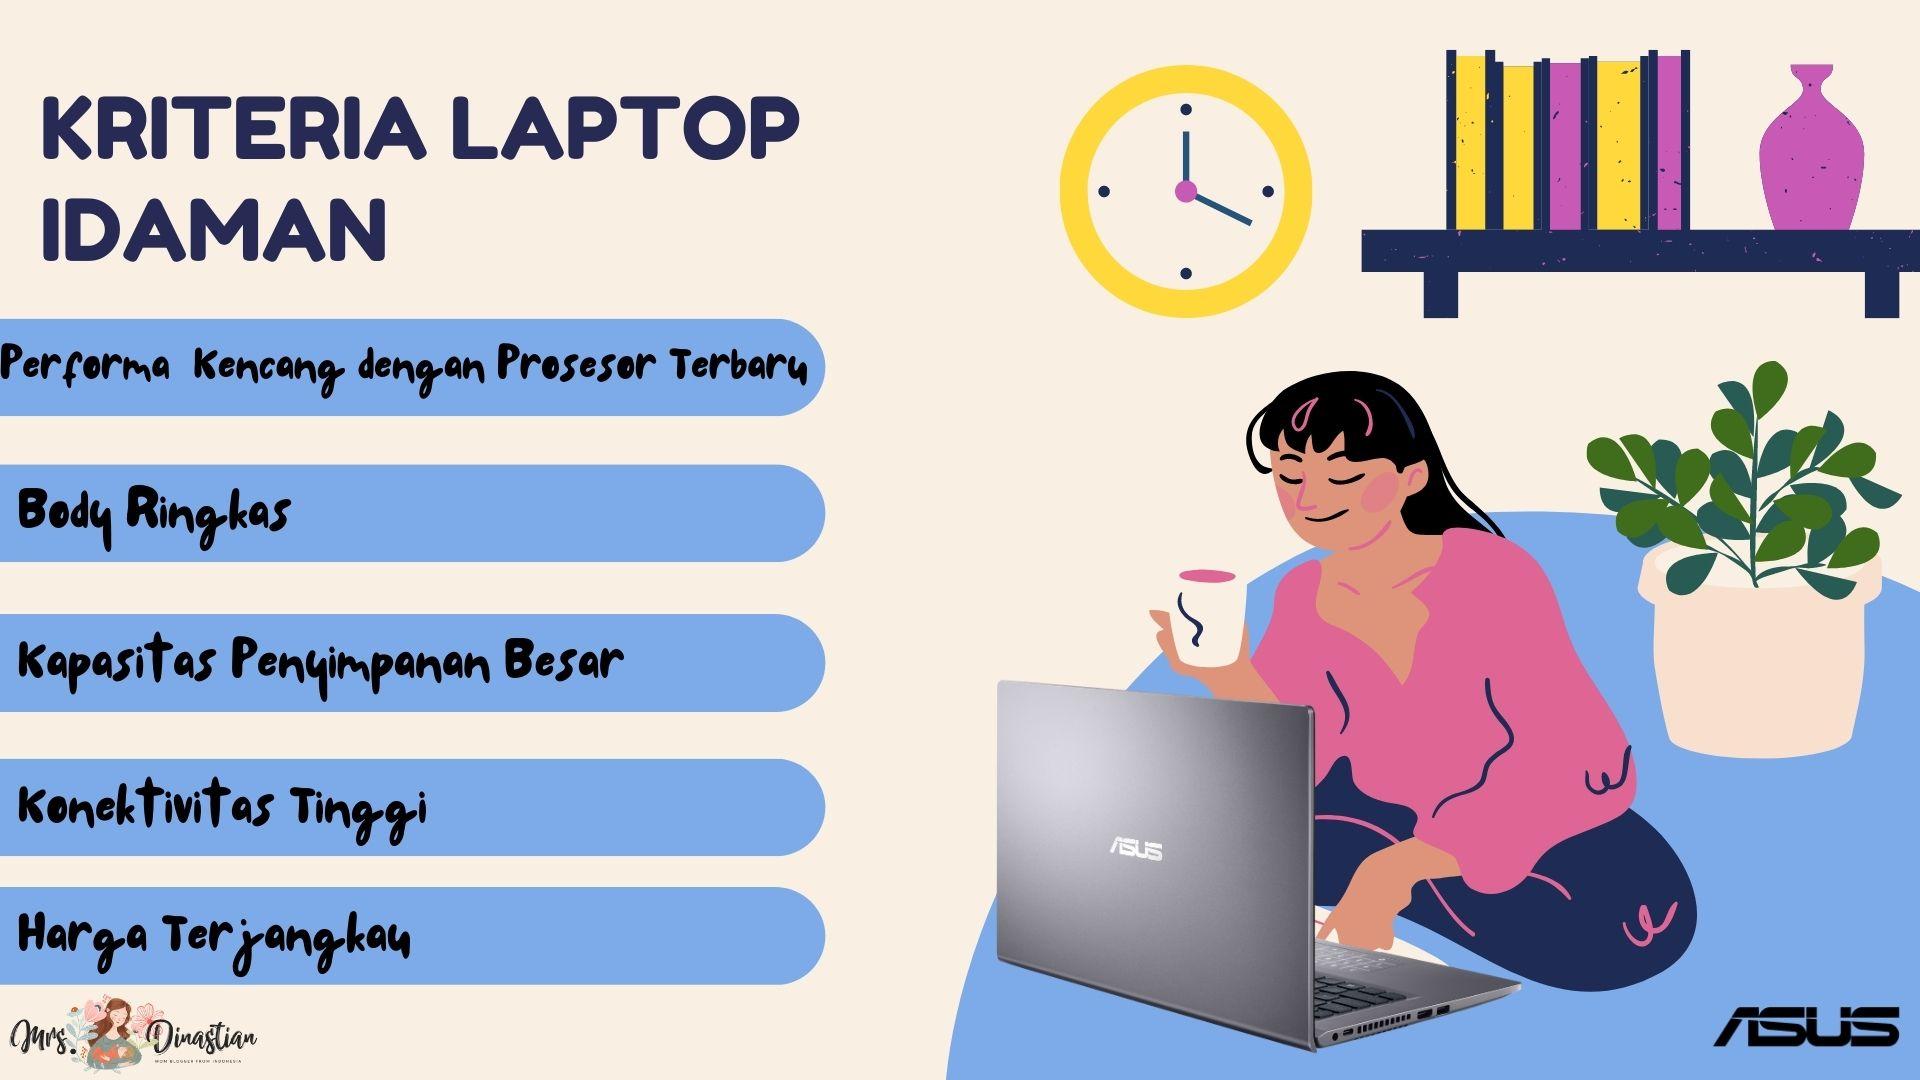 Kriteria Laptop Idaman Untuk WFH